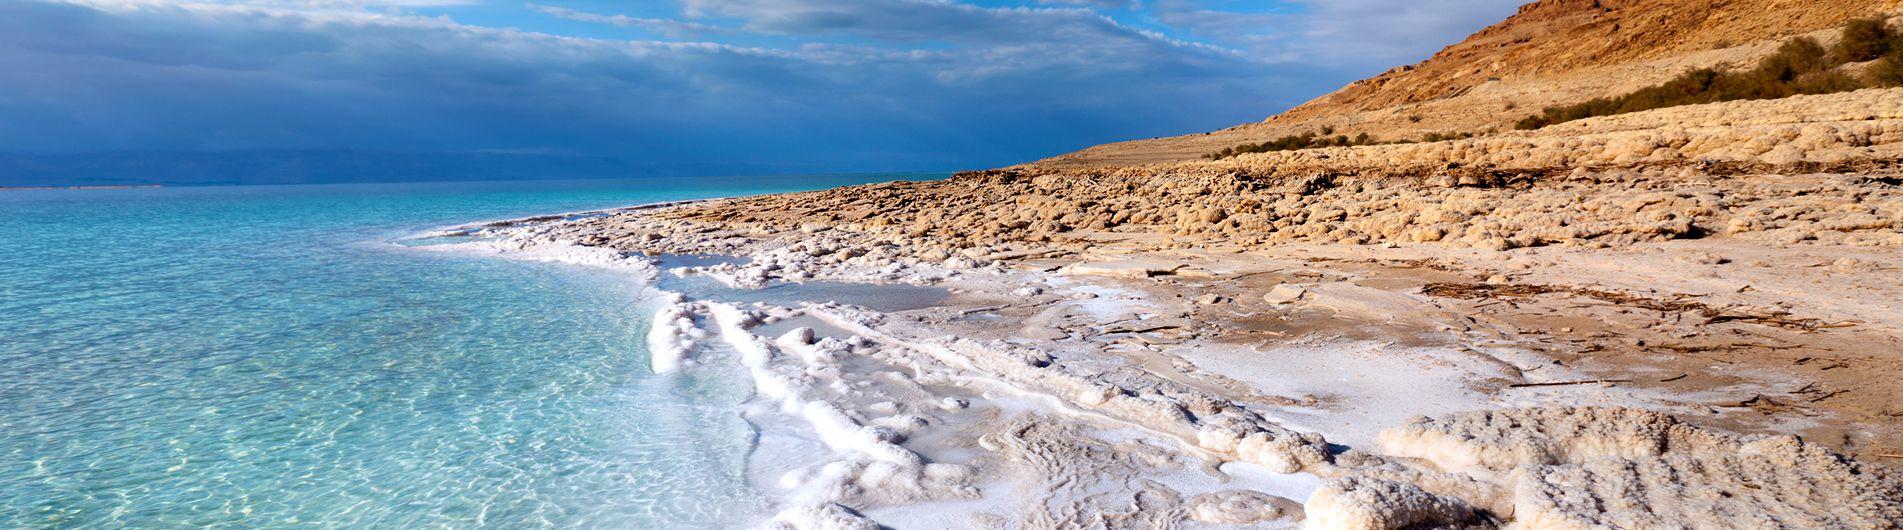 Dead Sea, Jordan Holidays